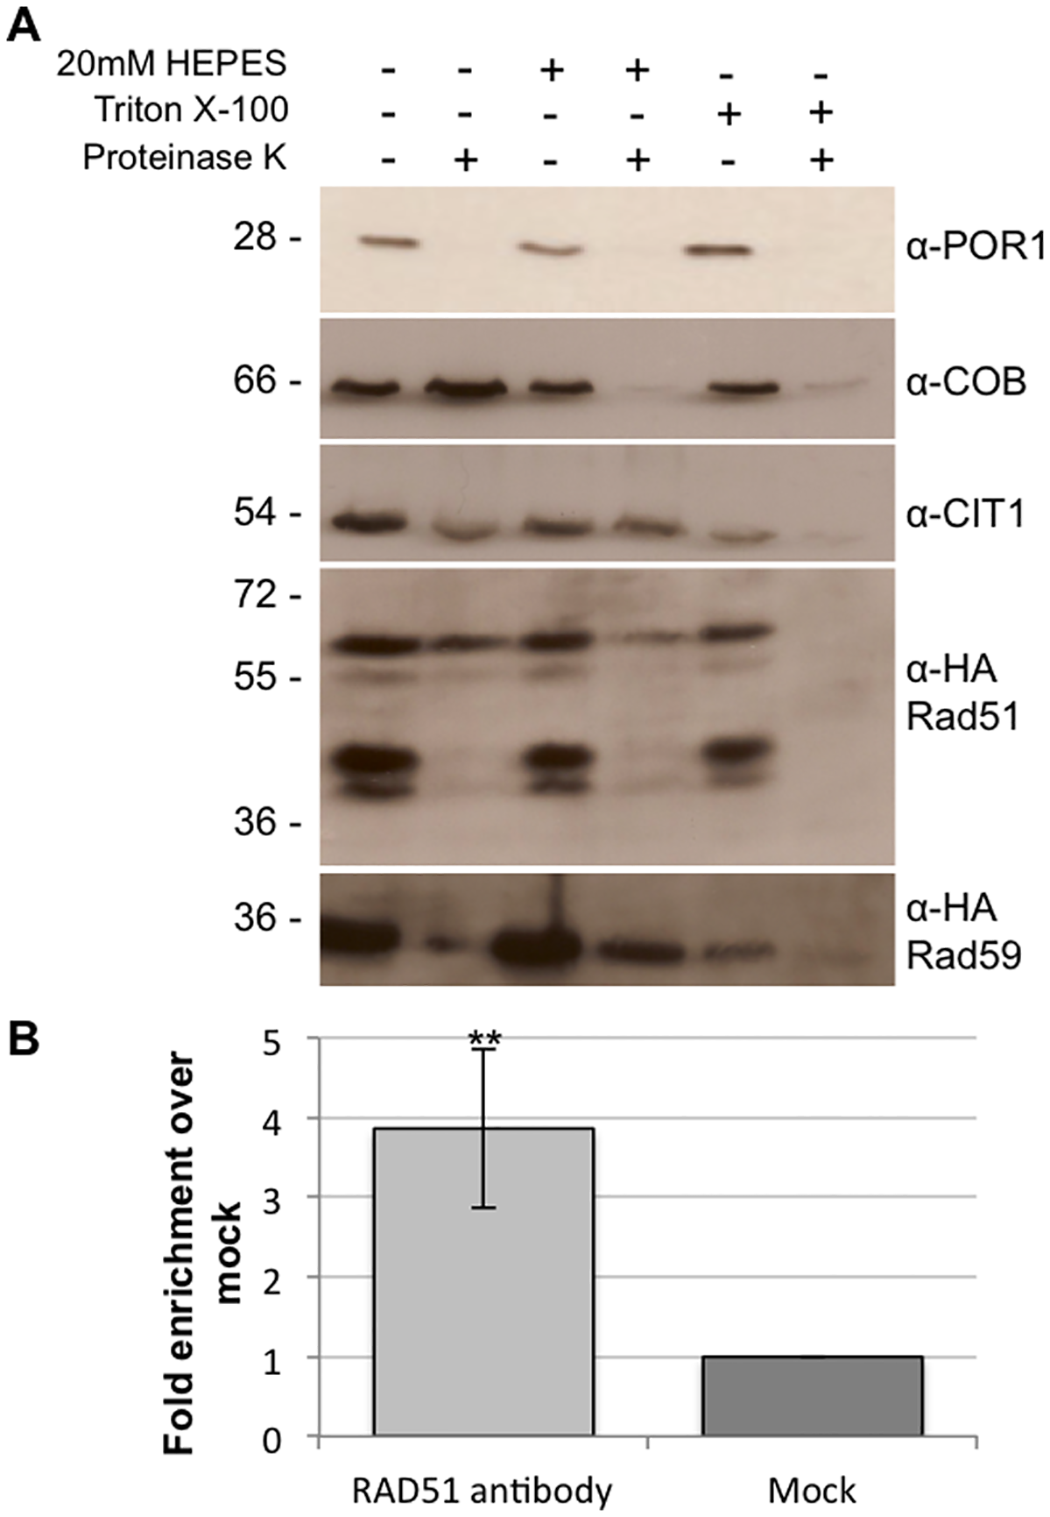 Rad51p and Rad59p localize to the mitochondrial matrix.